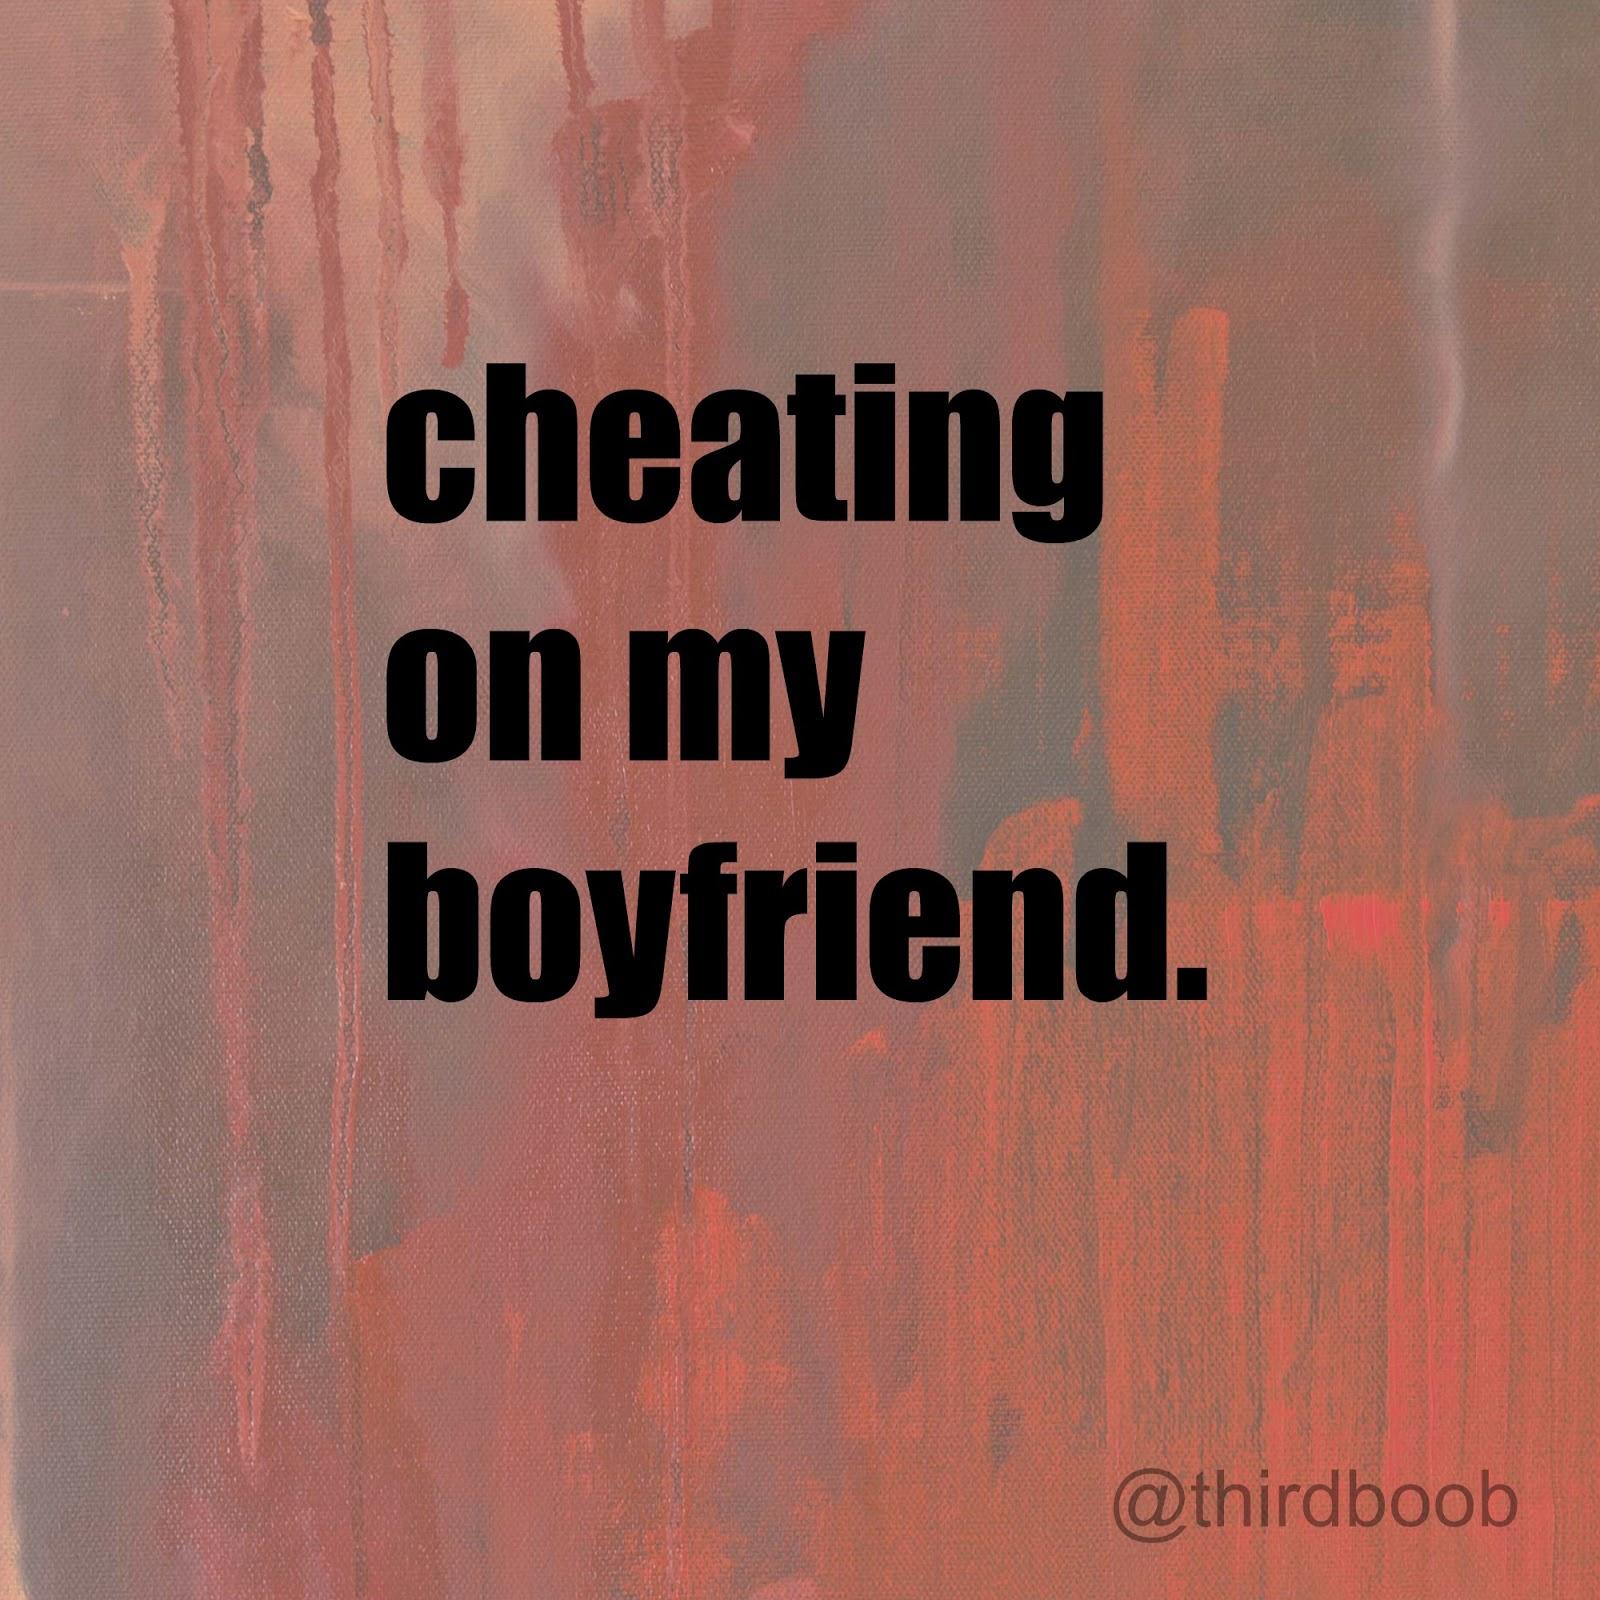 the third boob: cheating on my boyfriend